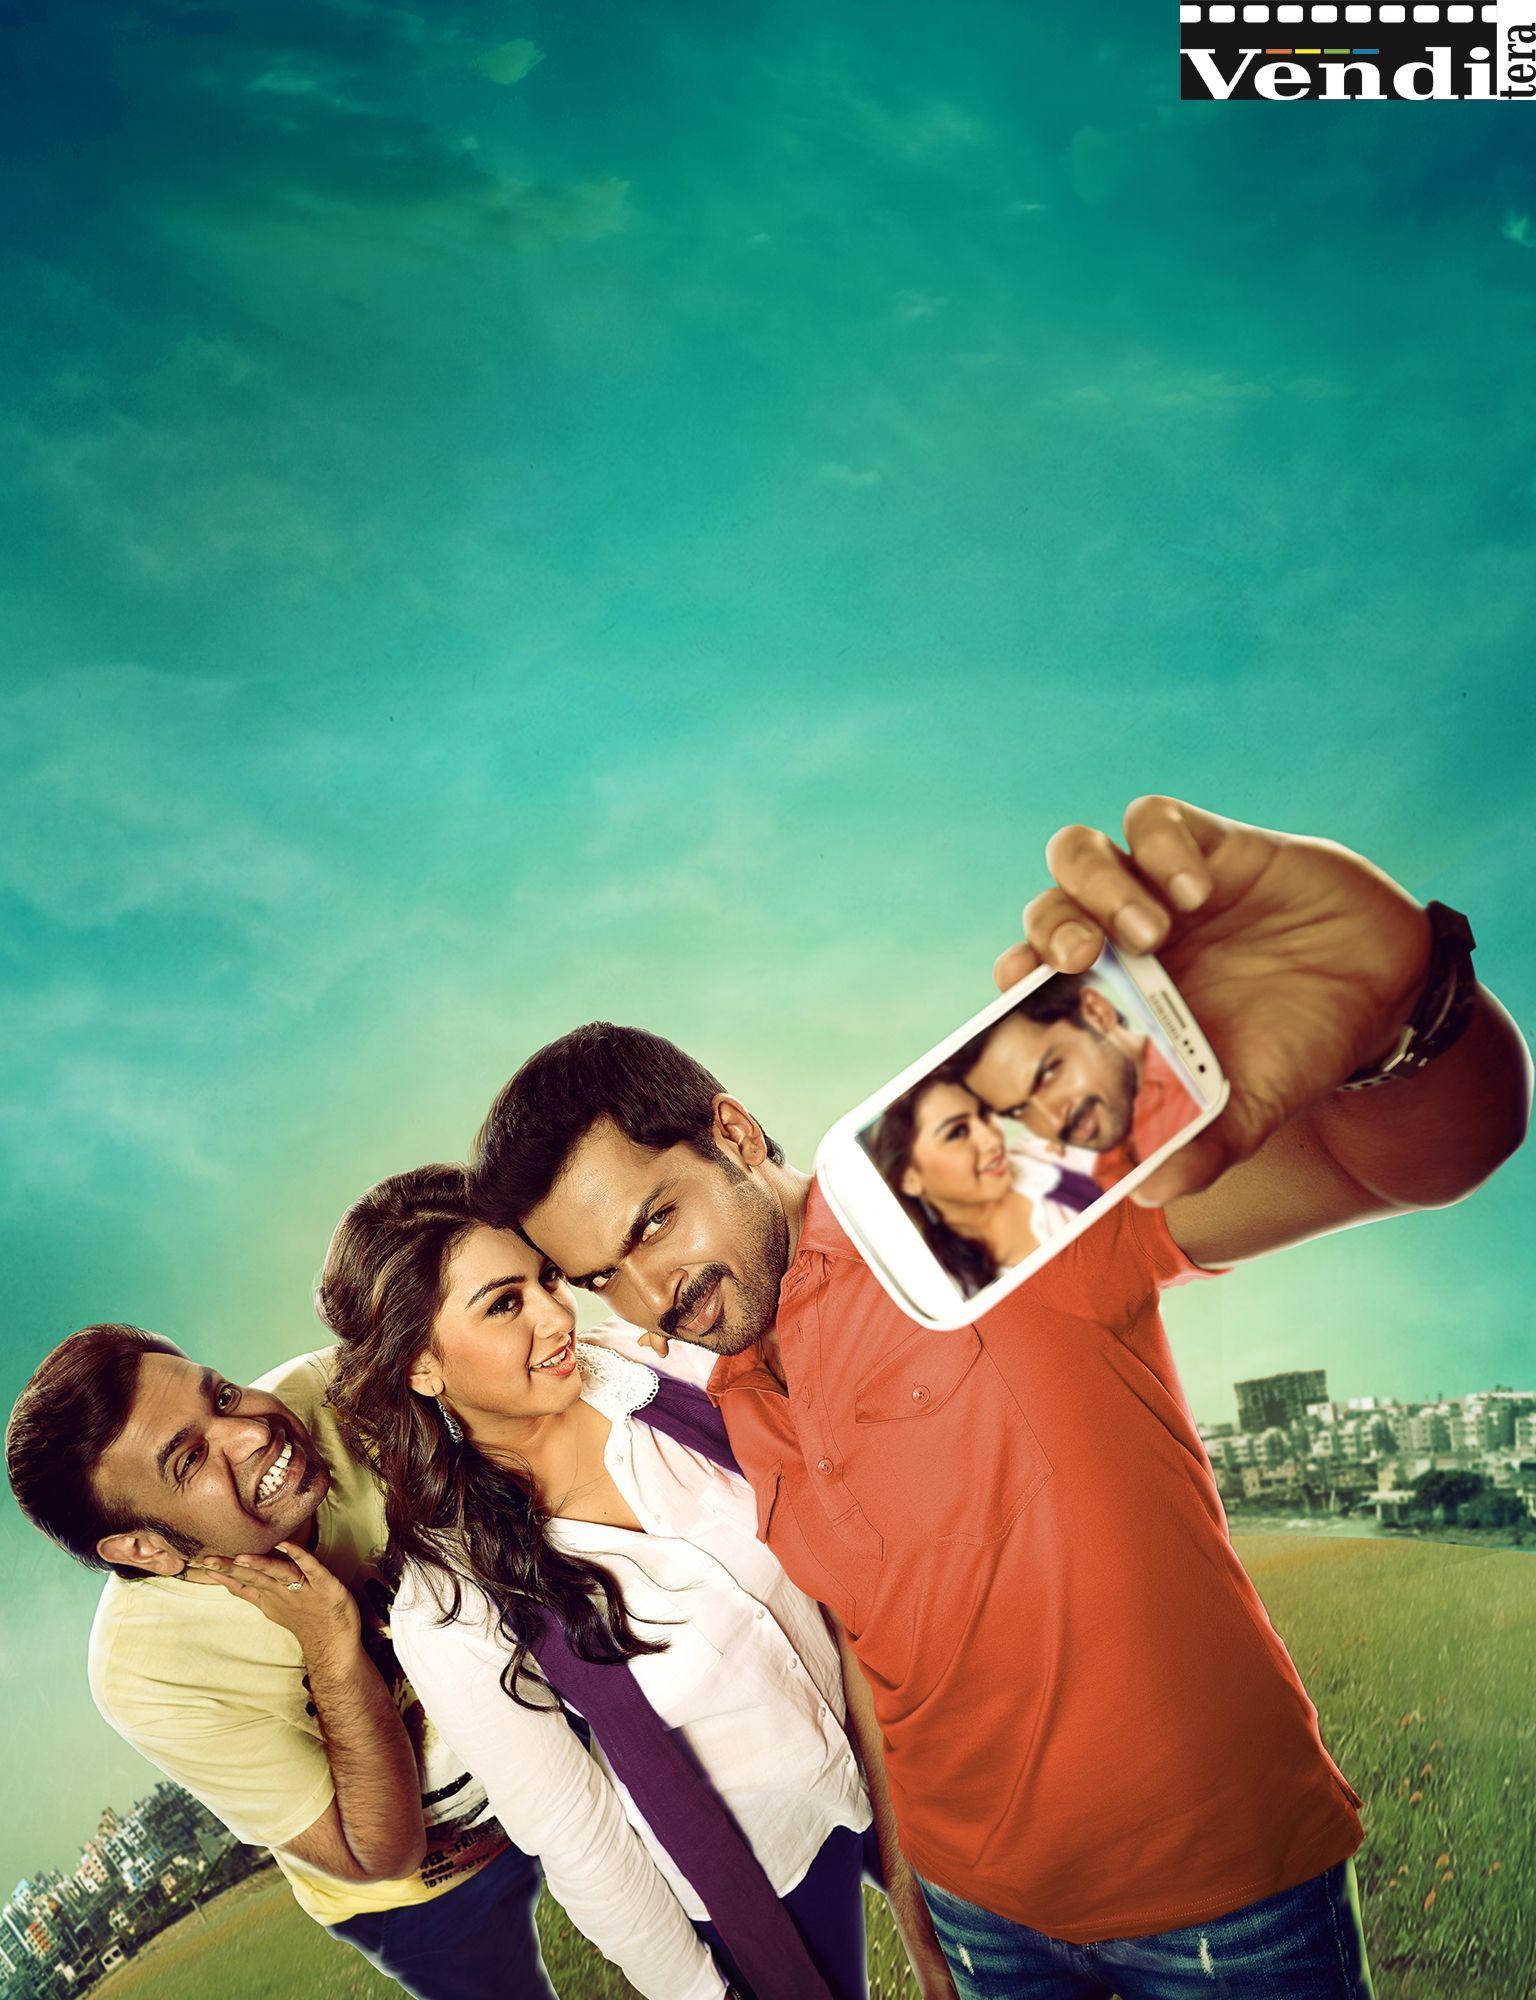 Biryani Telugu Movie Wallpapers - http://venditera.in/gallery/biryani-telugu-movie-wallpapers/